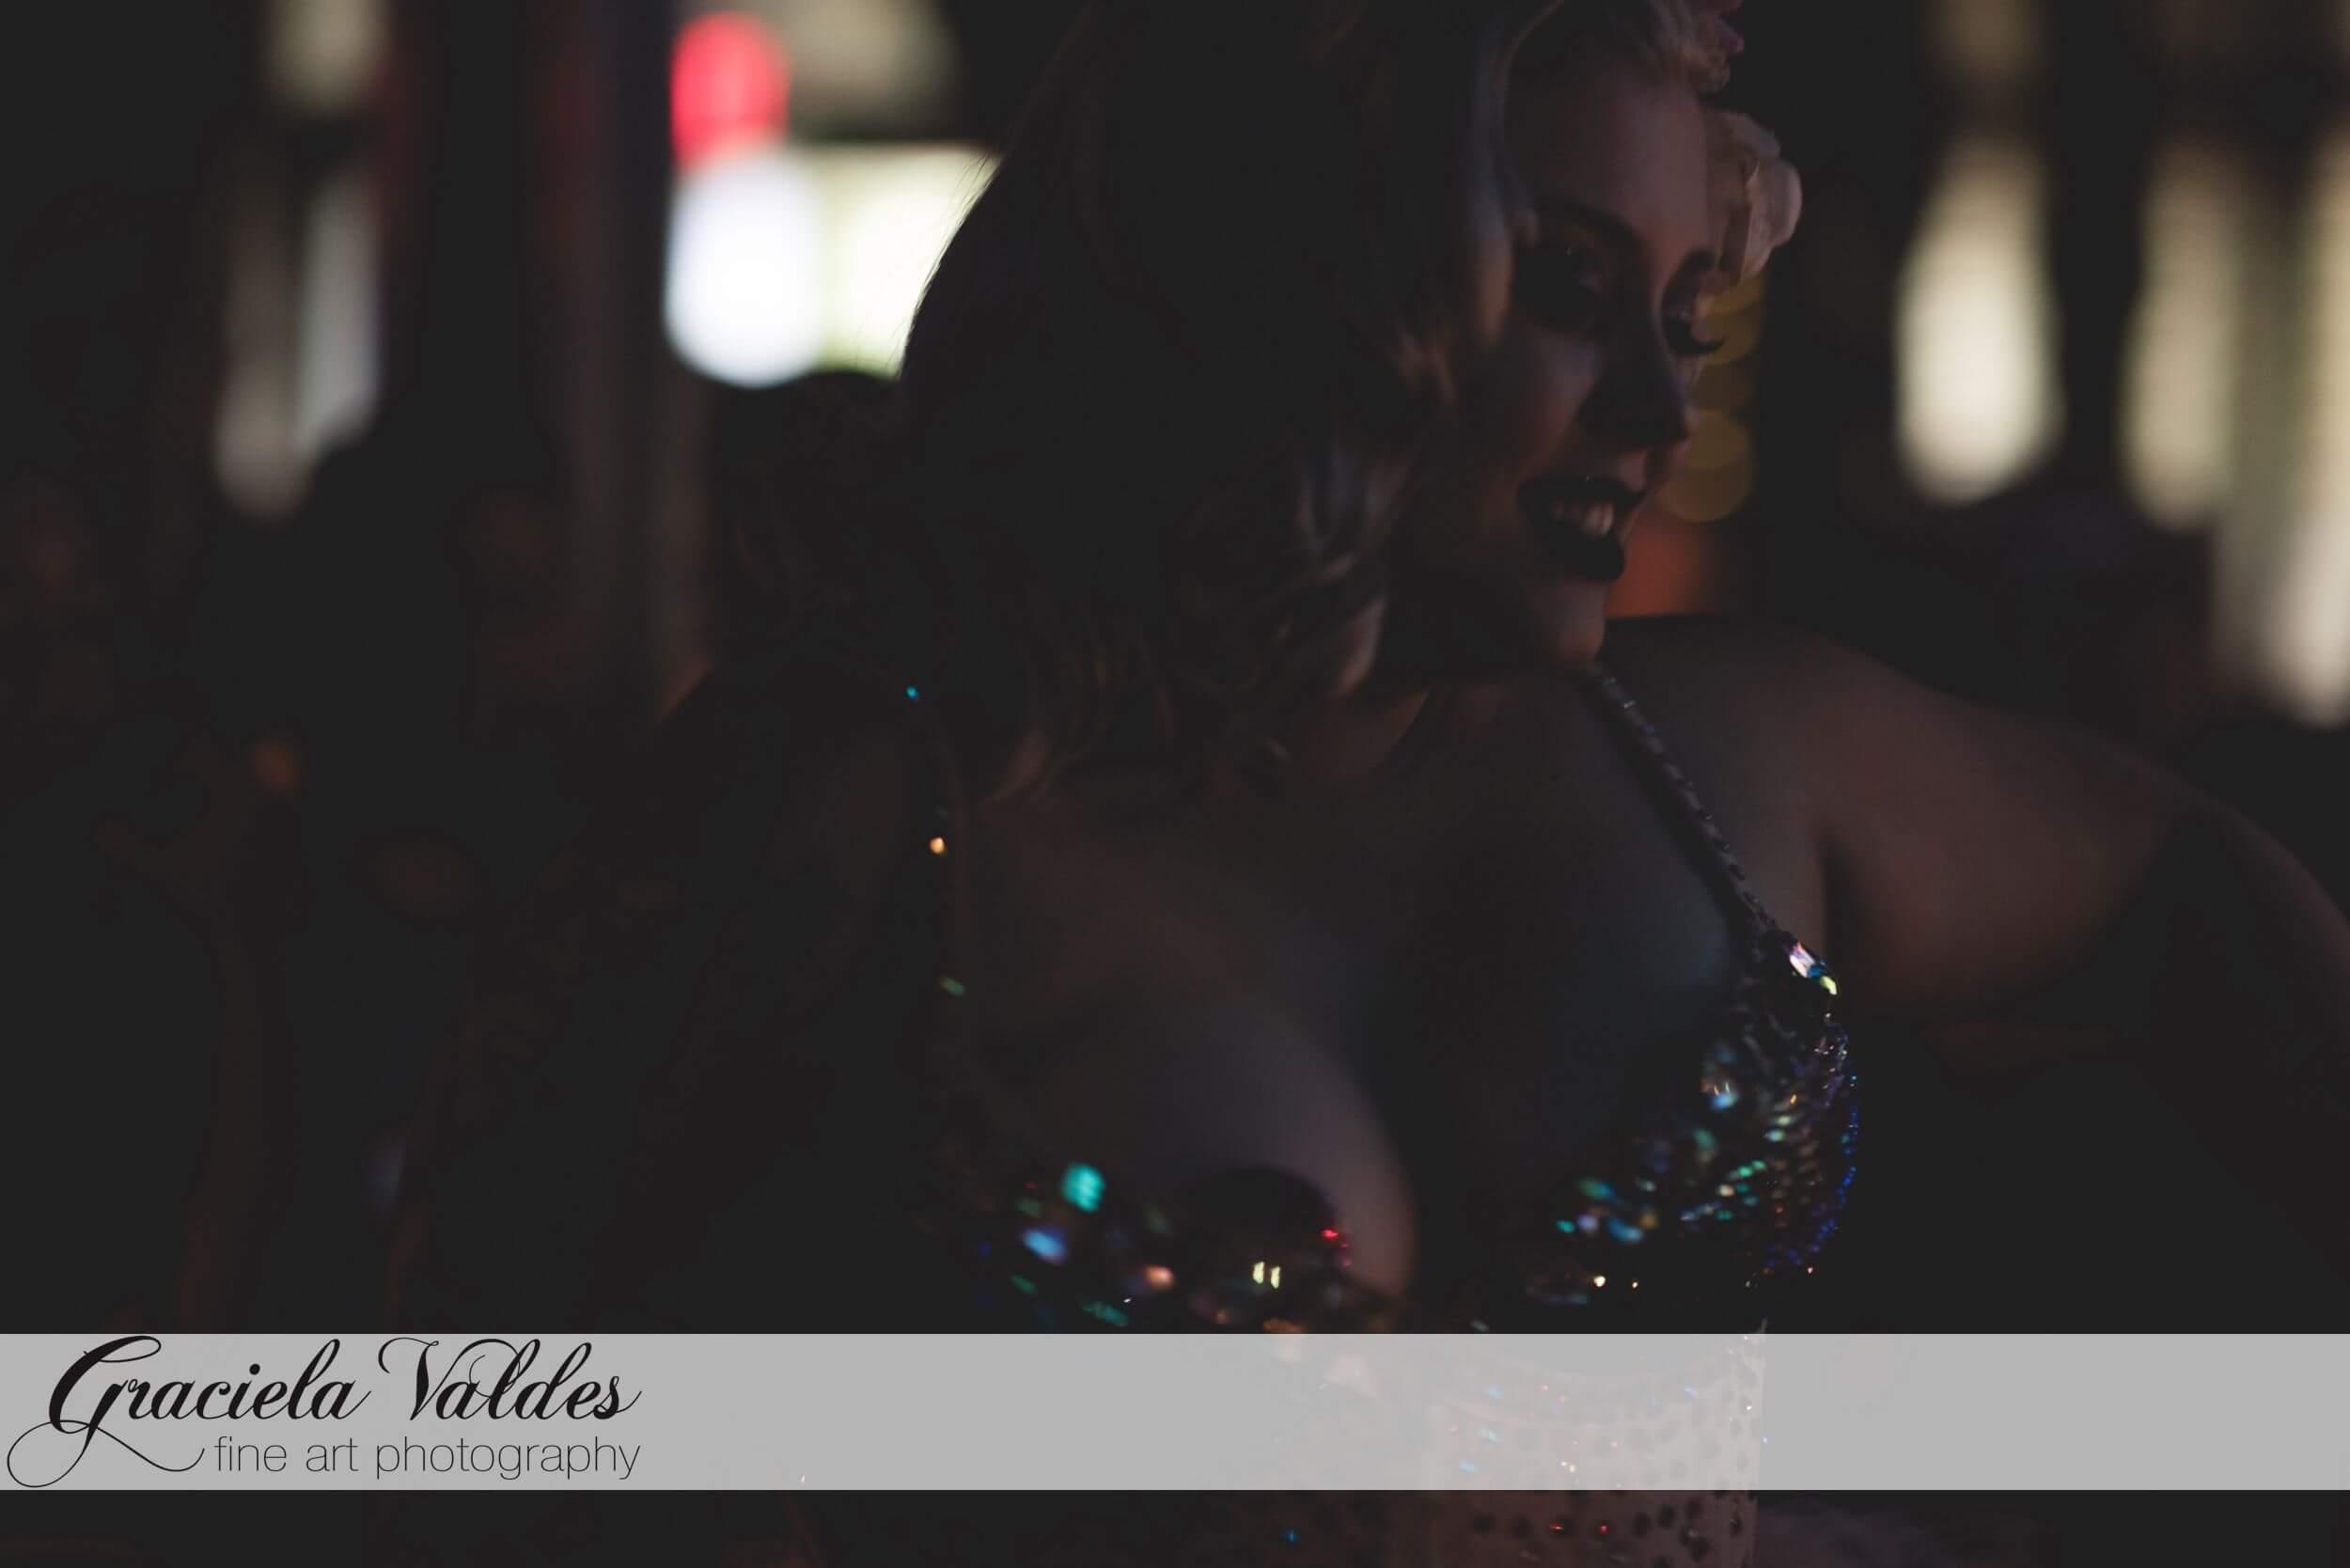 Sex After Dark by Graciela Valdes 33.jpg